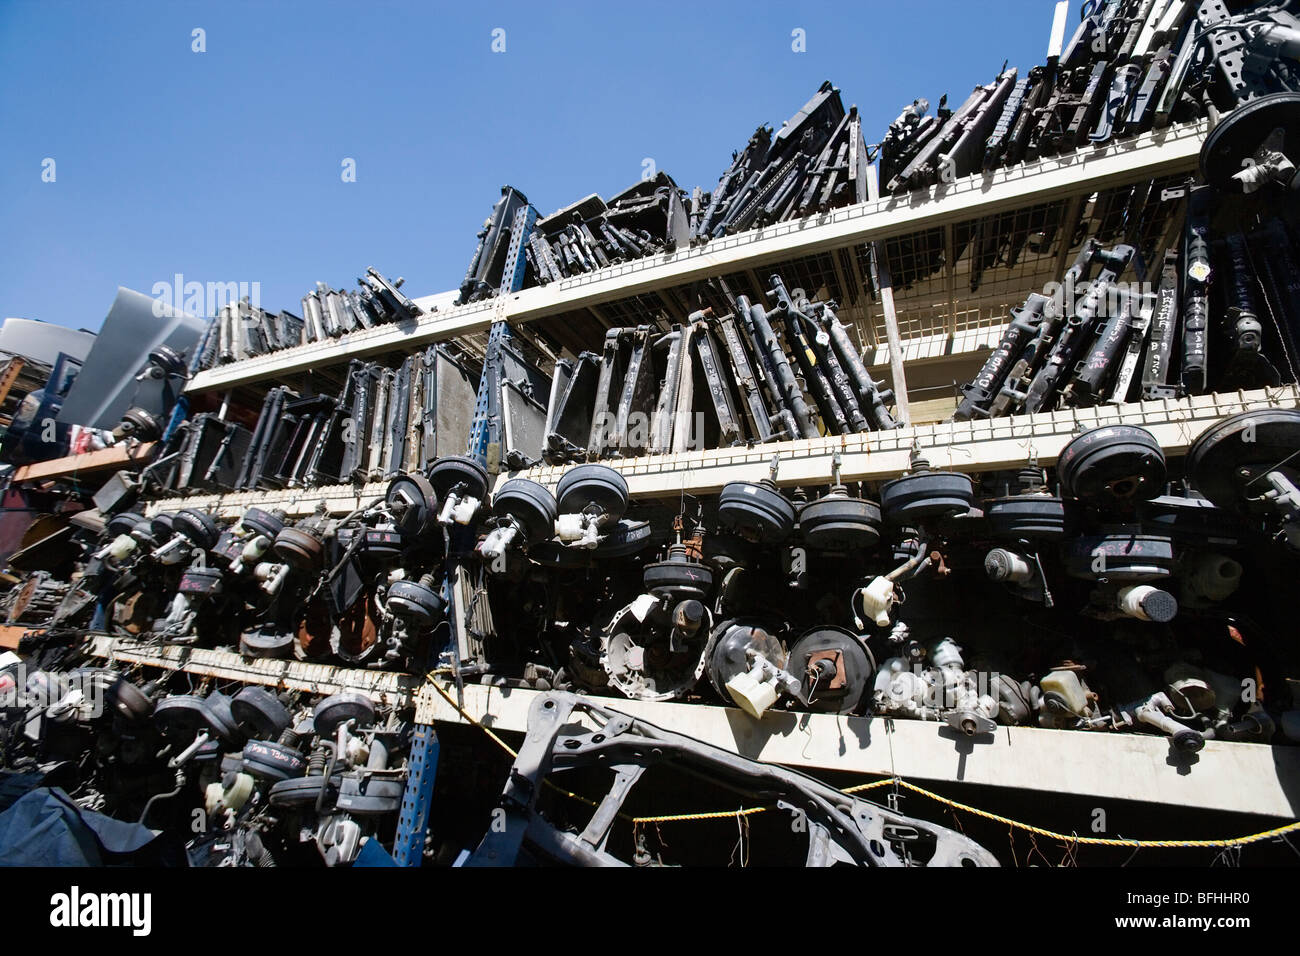 Old car parts in junkyard Stock Photo: 26817364 - Alamy